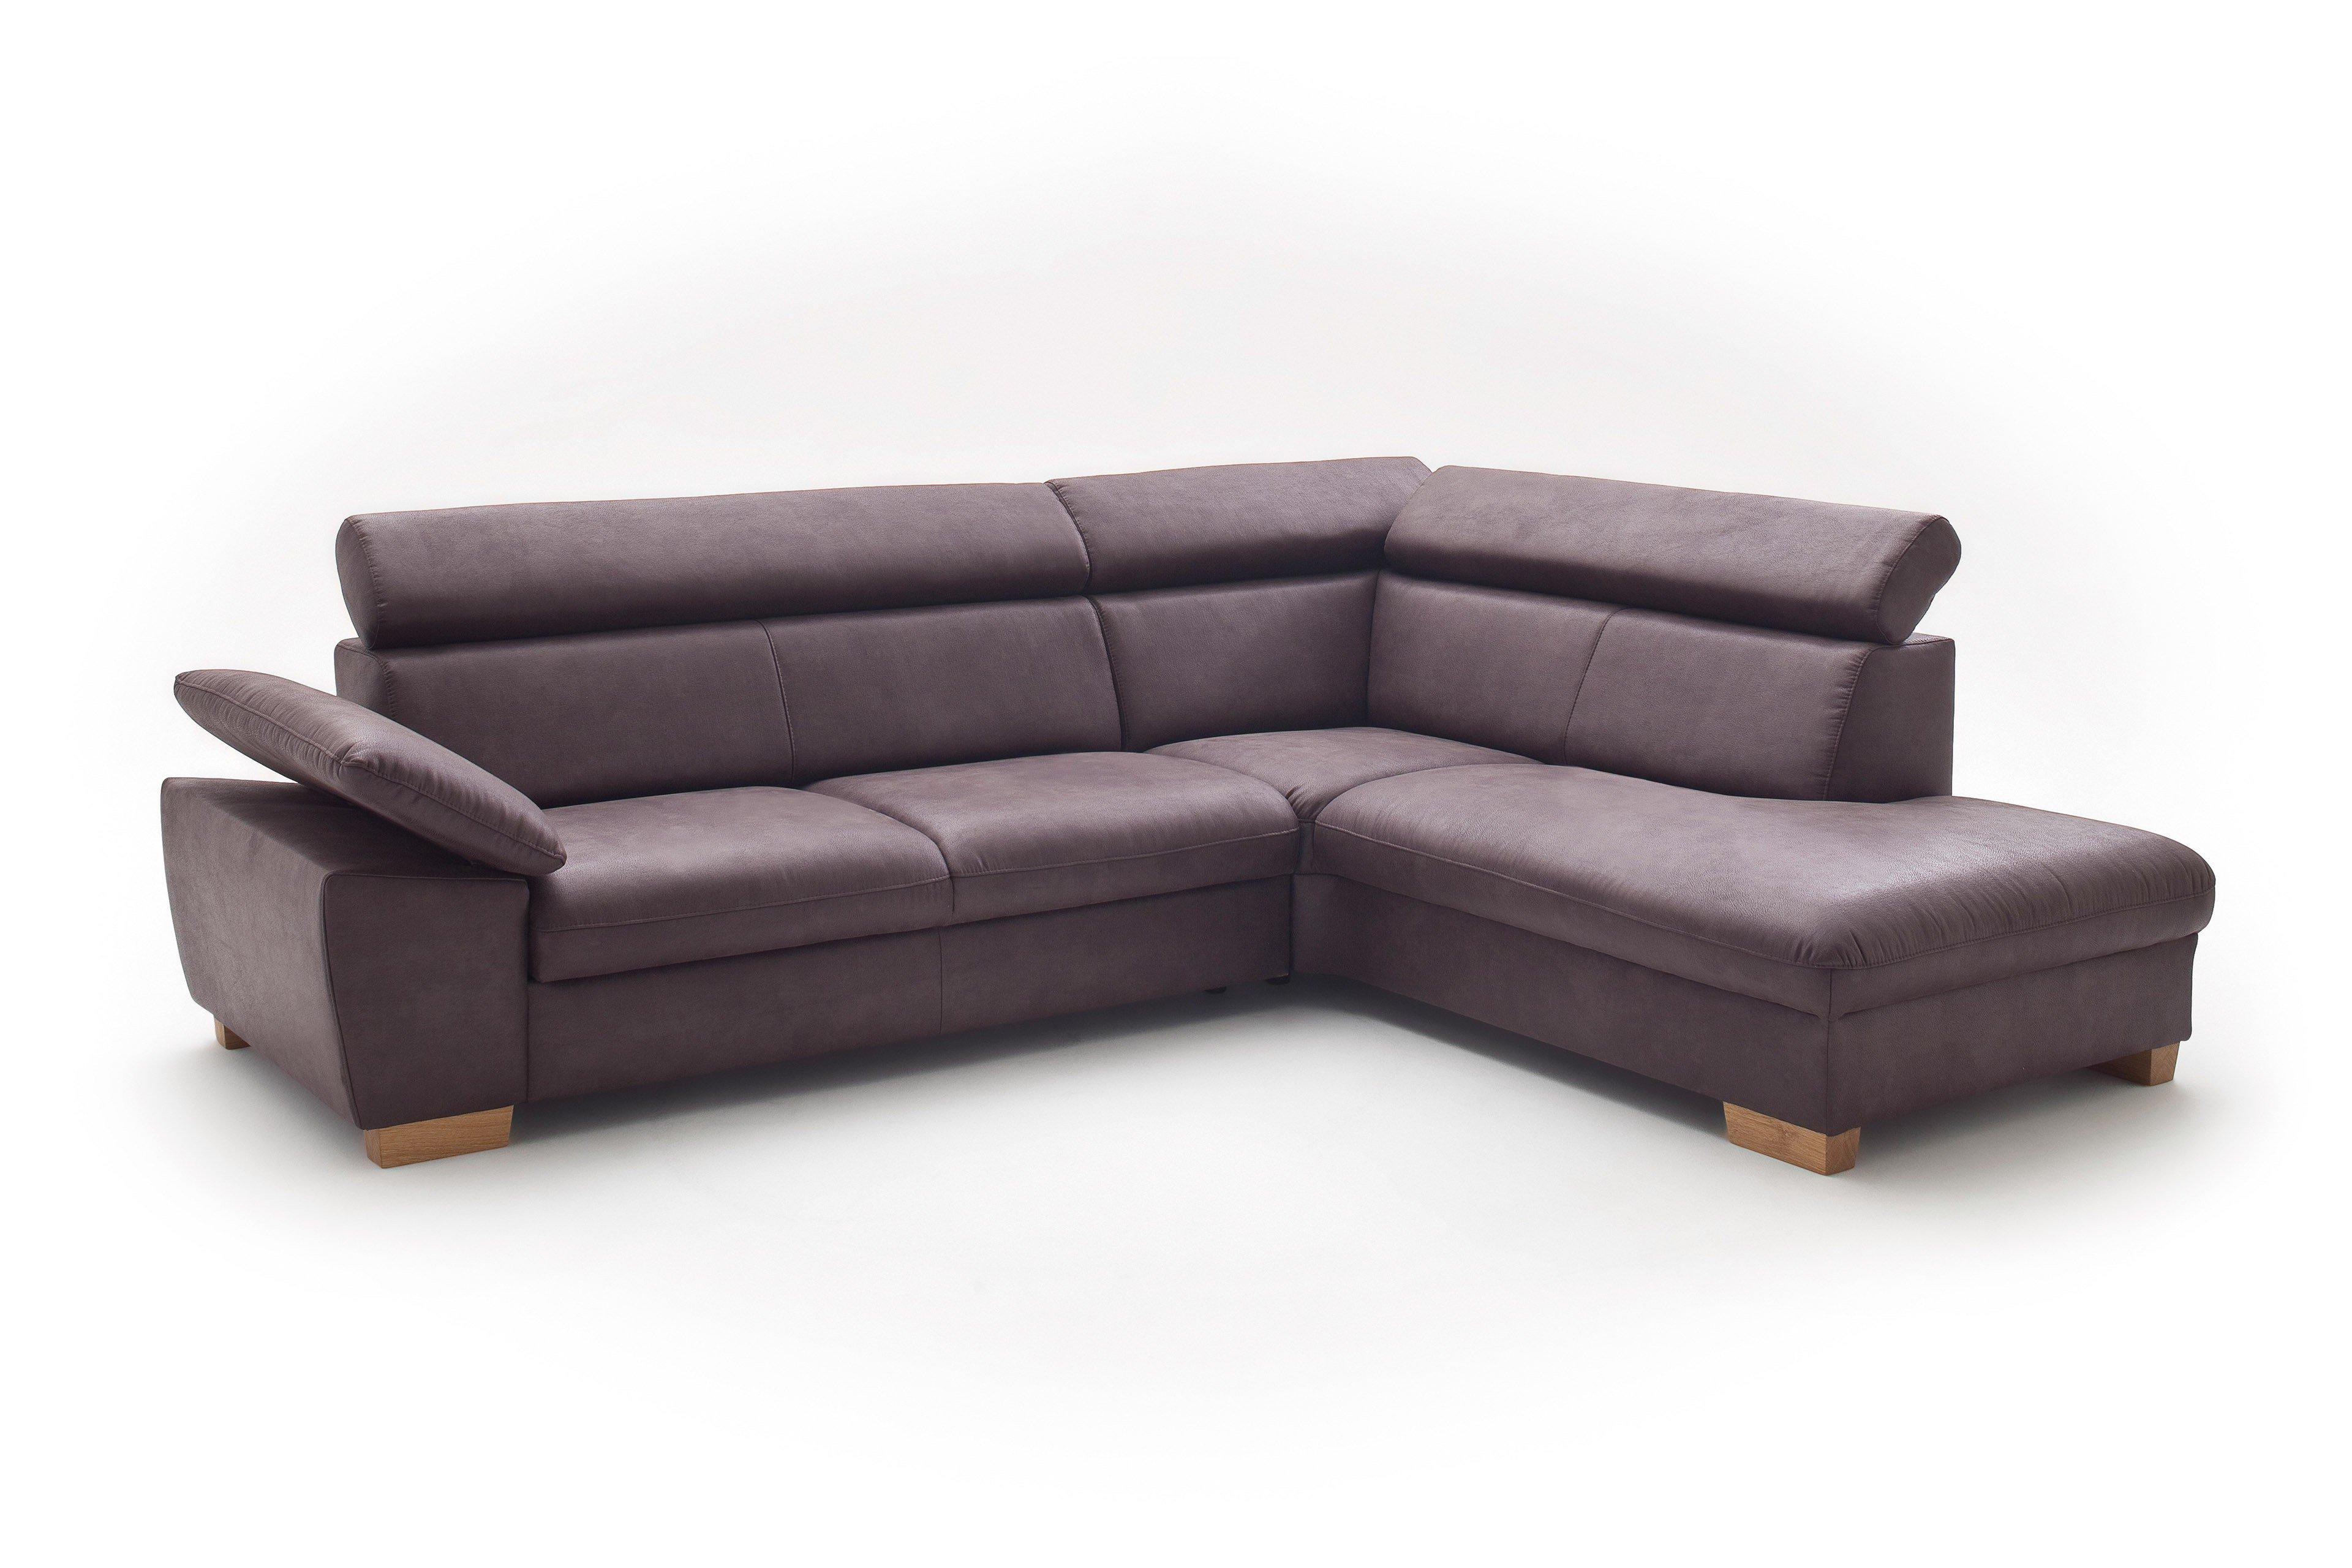 dfm quincy ecksofa braun m bel letz ihr online shop. Black Bedroom Furniture Sets. Home Design Ideas